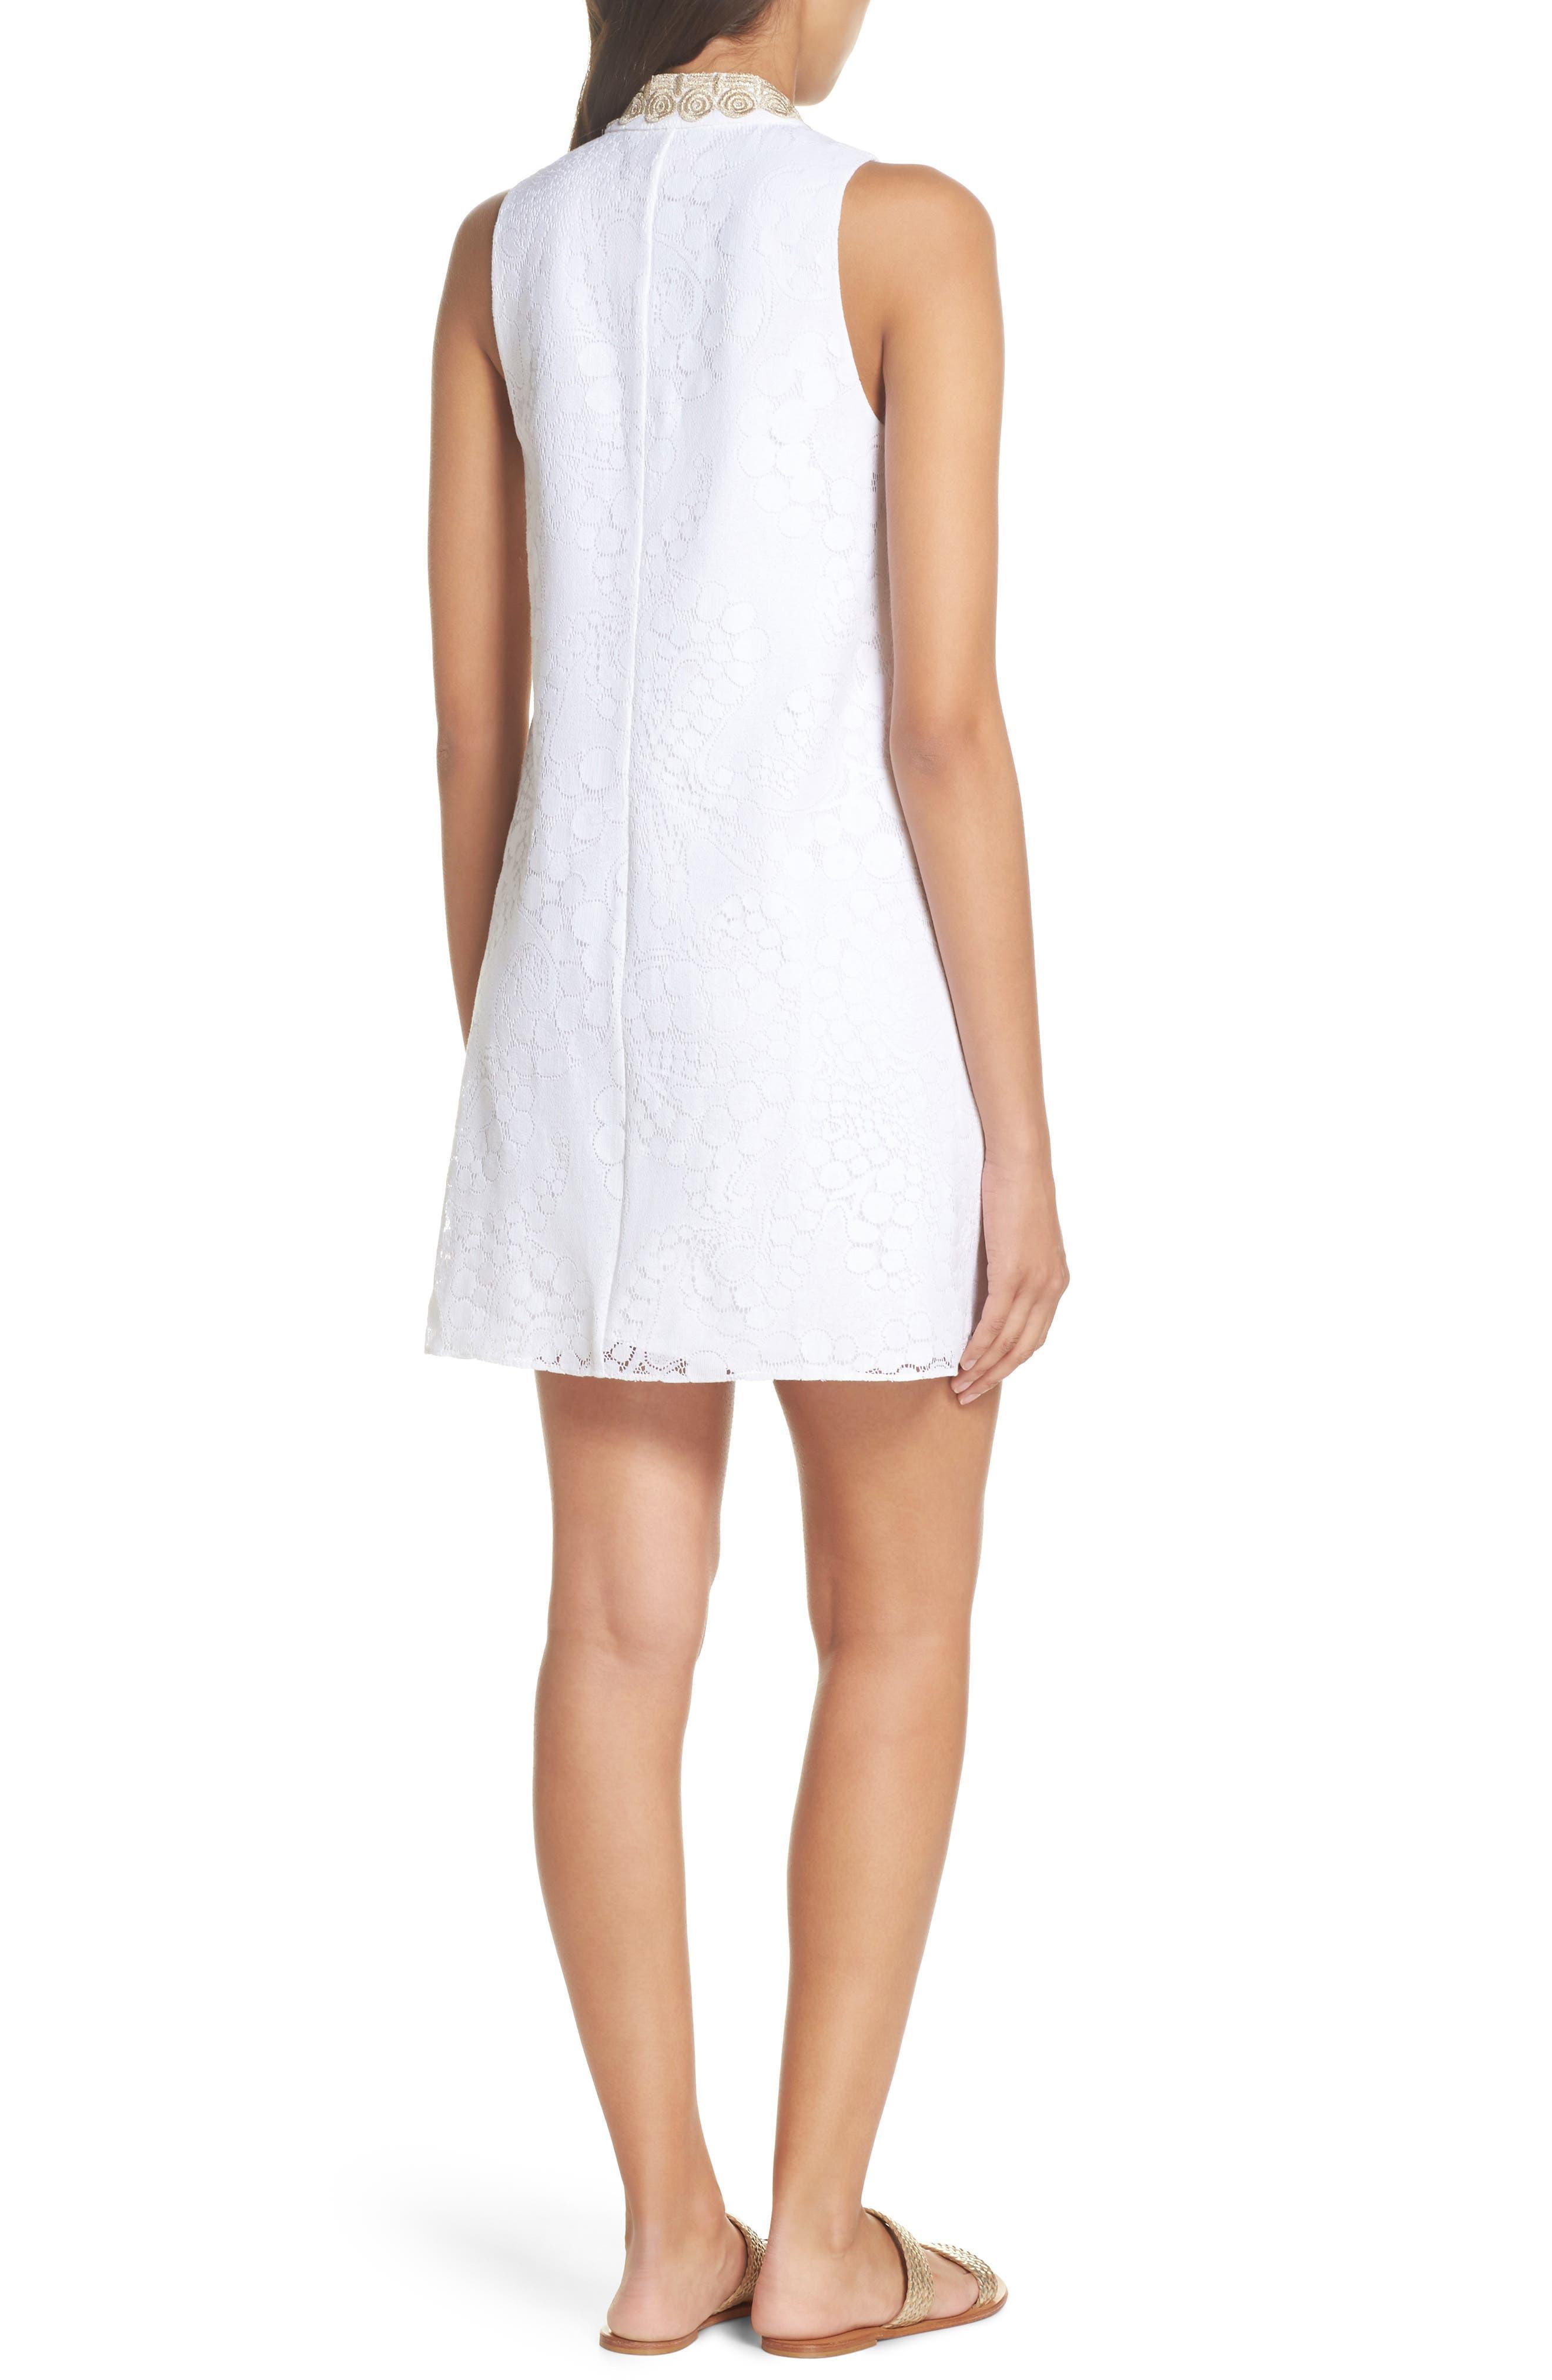 Jane Lace Shift Dress,                             Alternate thumbnail 2, color,                             RESORT WHITE MOCEAN LACE